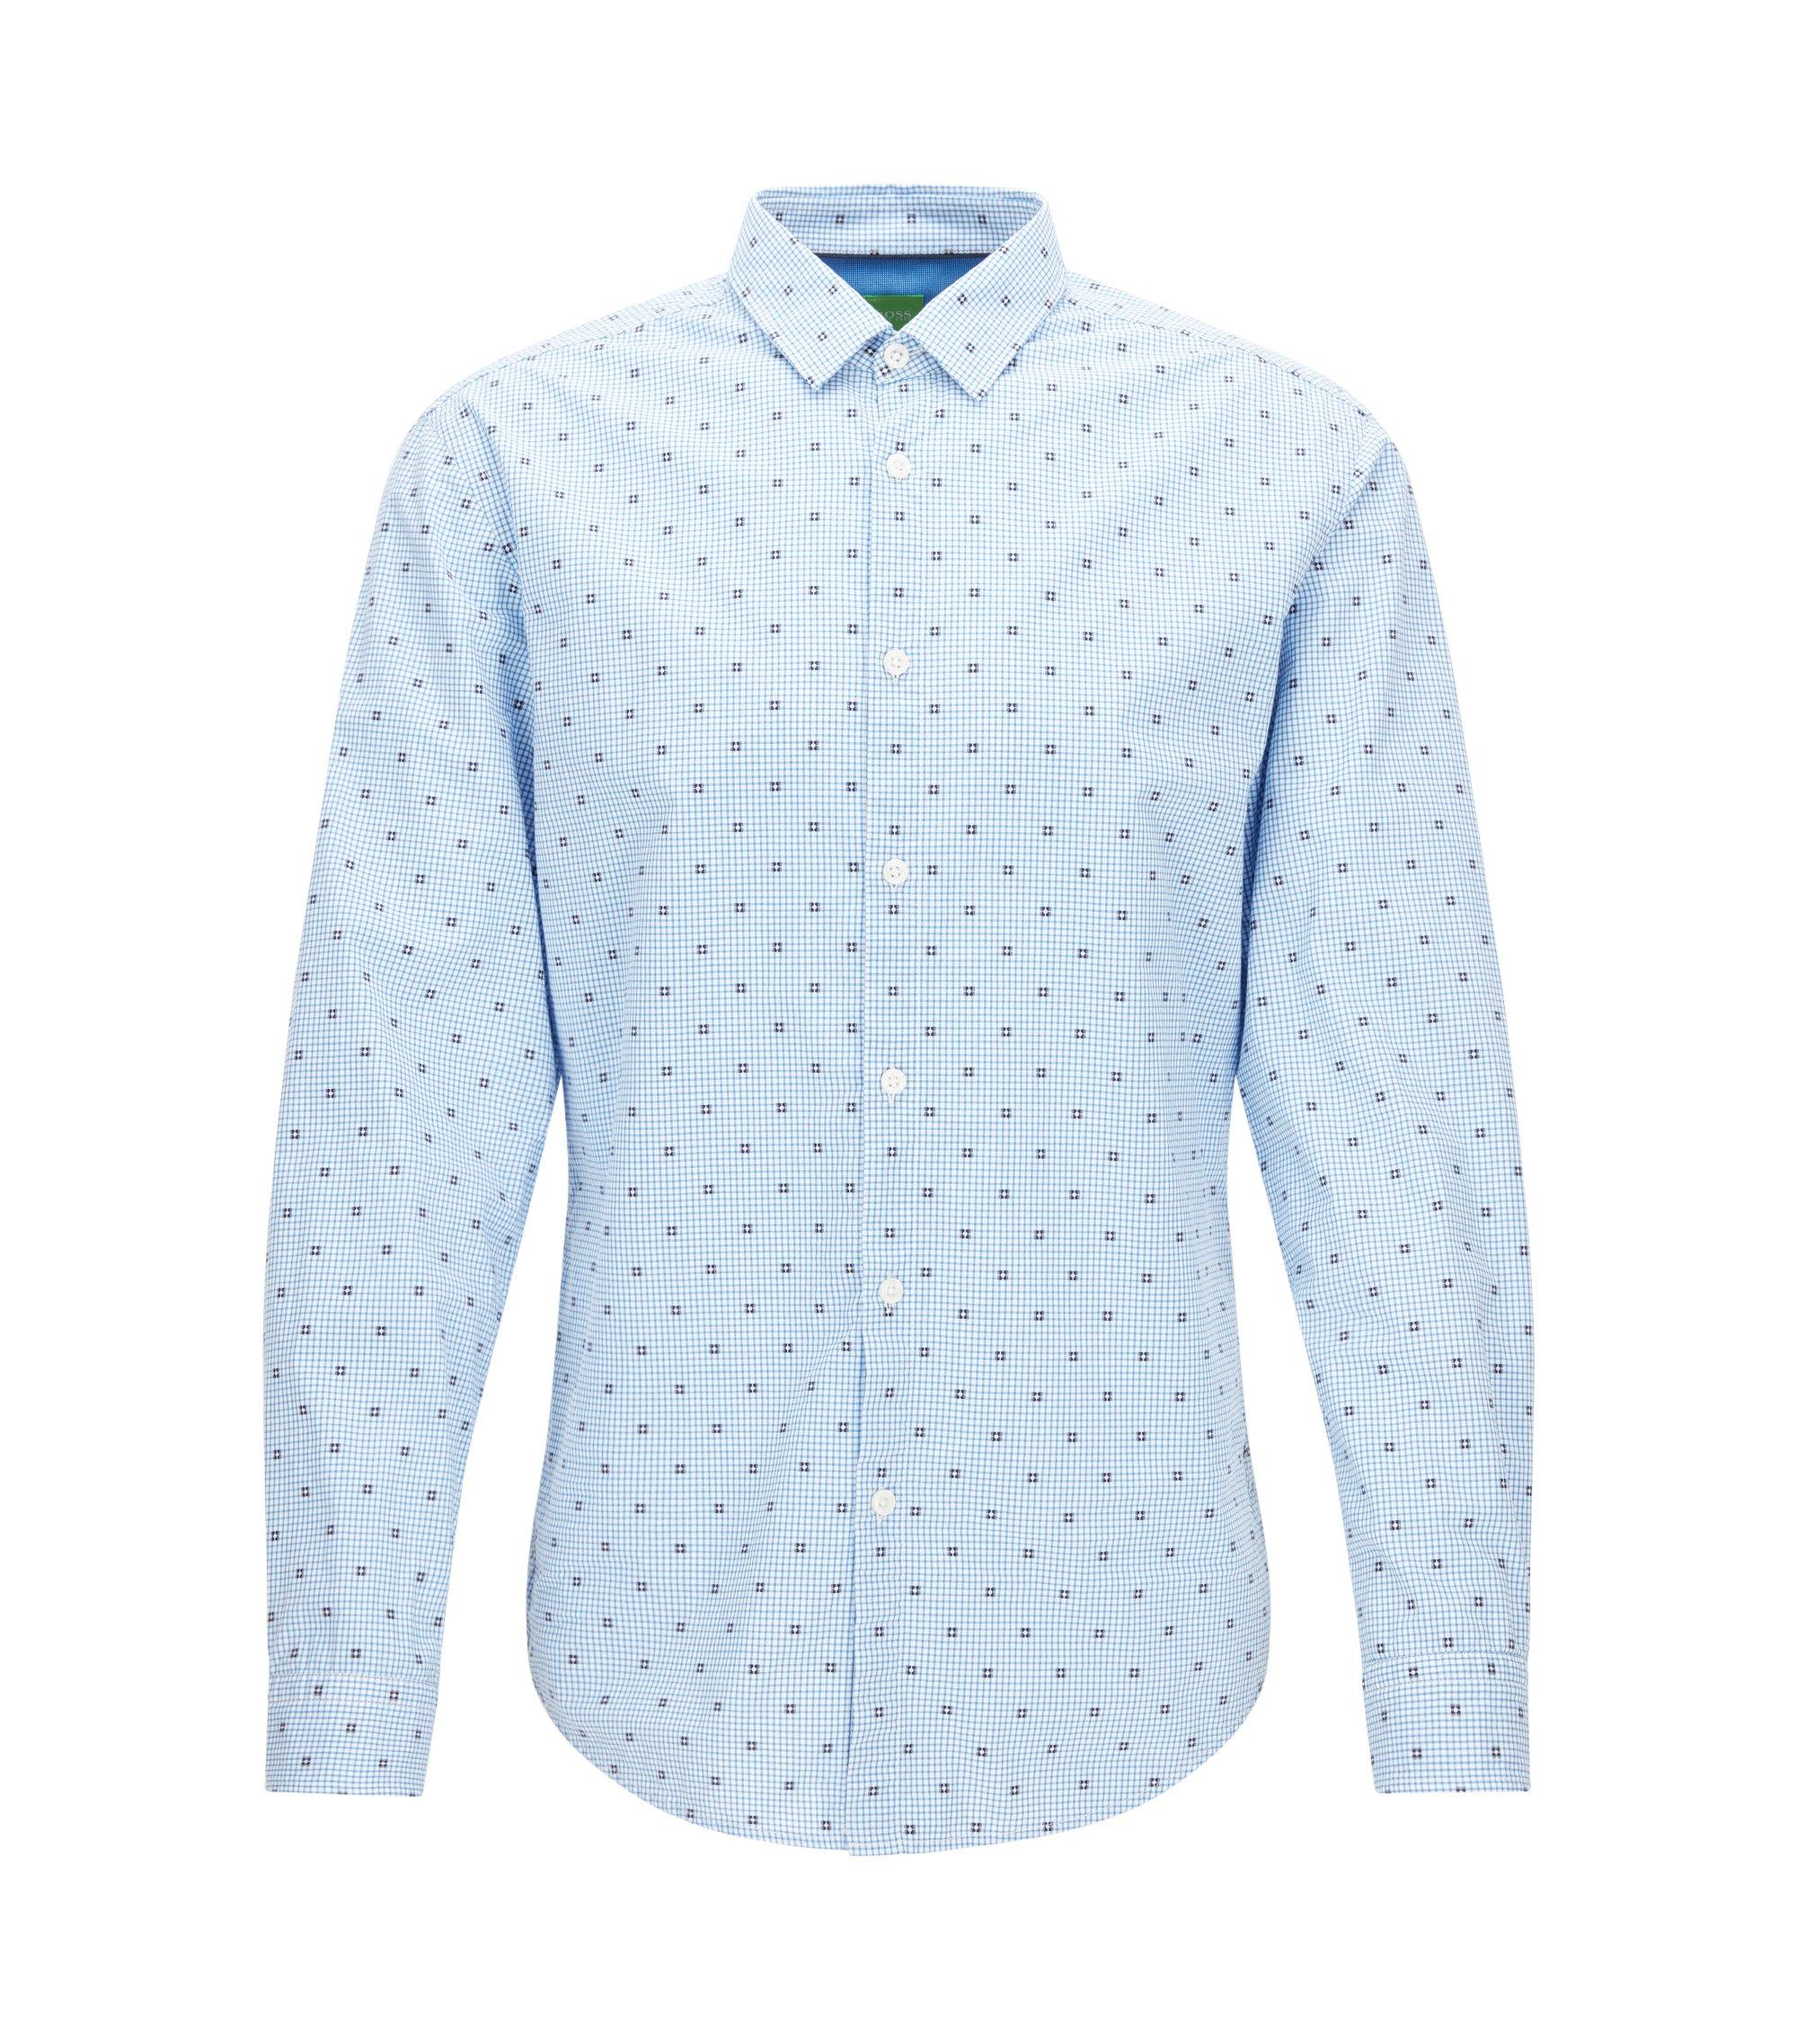 Kariertes Slim-Fit Hemd aus Baumwolle, Blau